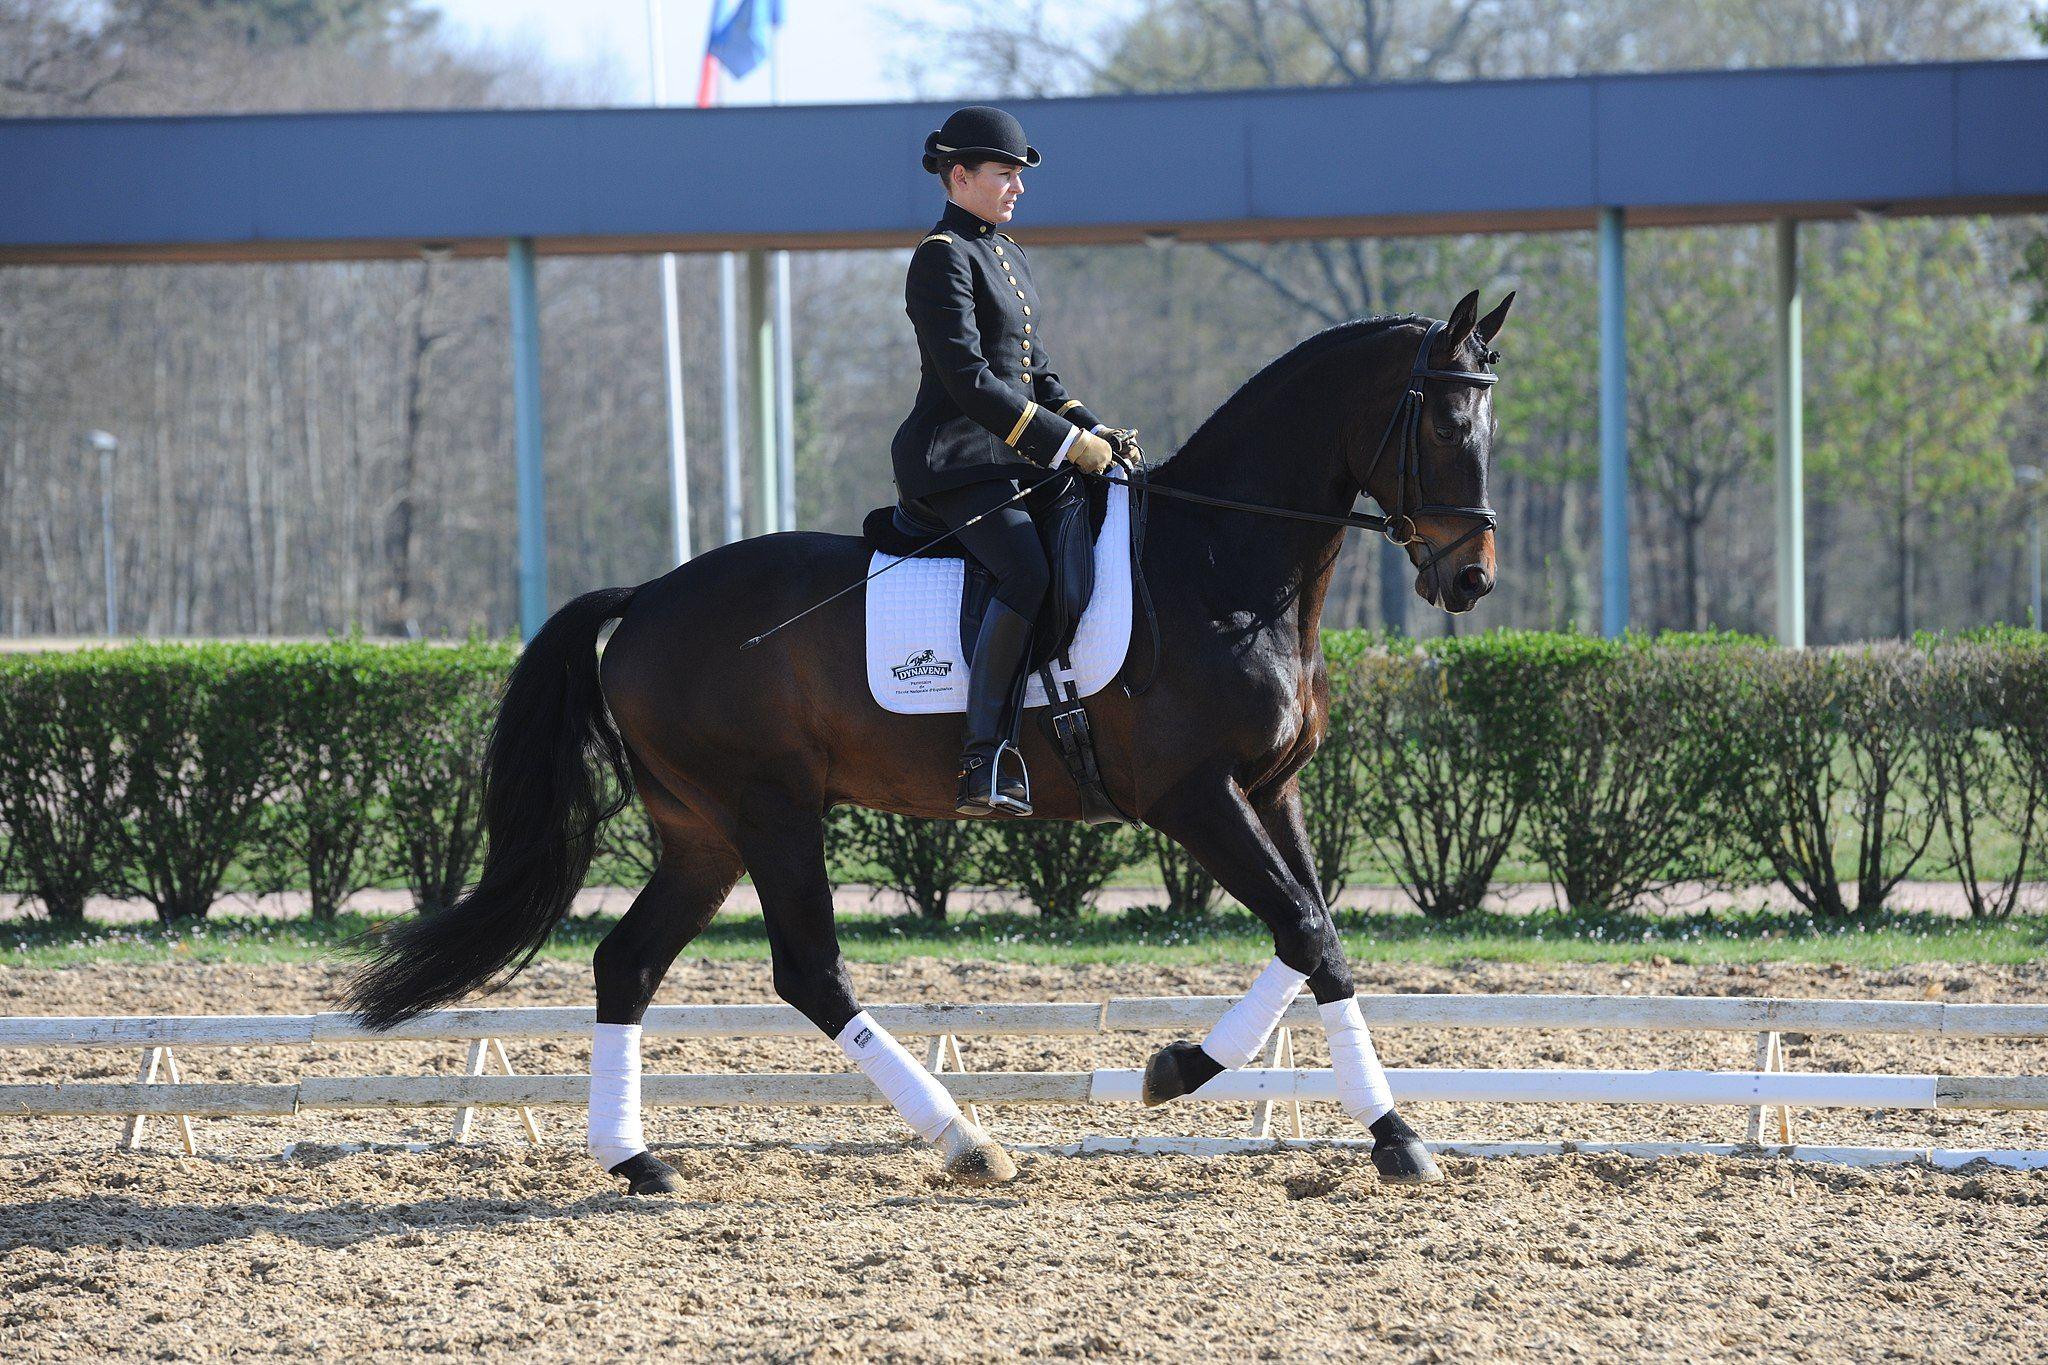 Hannoveraner Horses Animals Equestrian